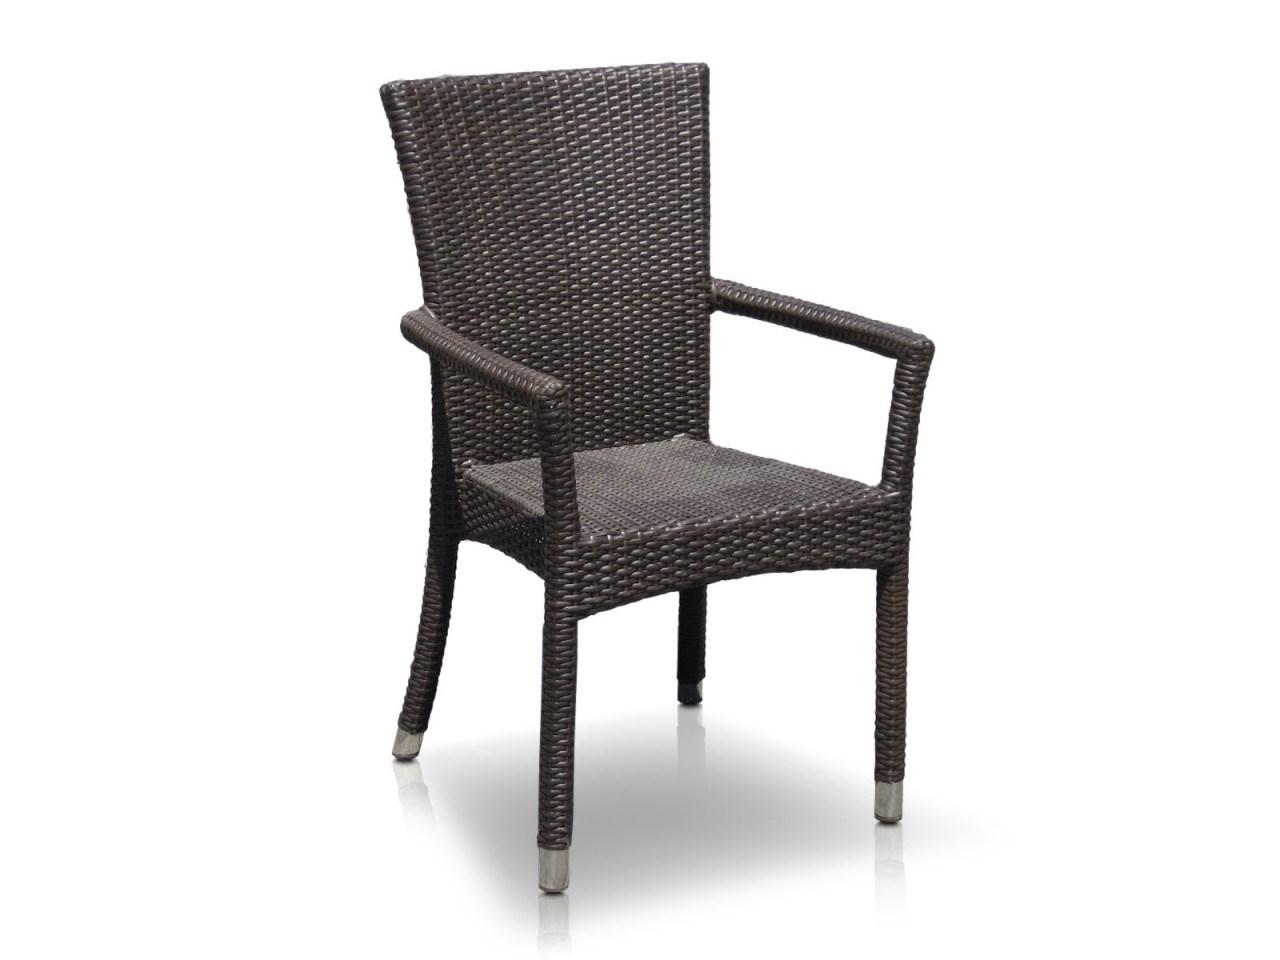 Chaise de rotin chaise de patio chaise en osier chaise - Chaise en osier ...